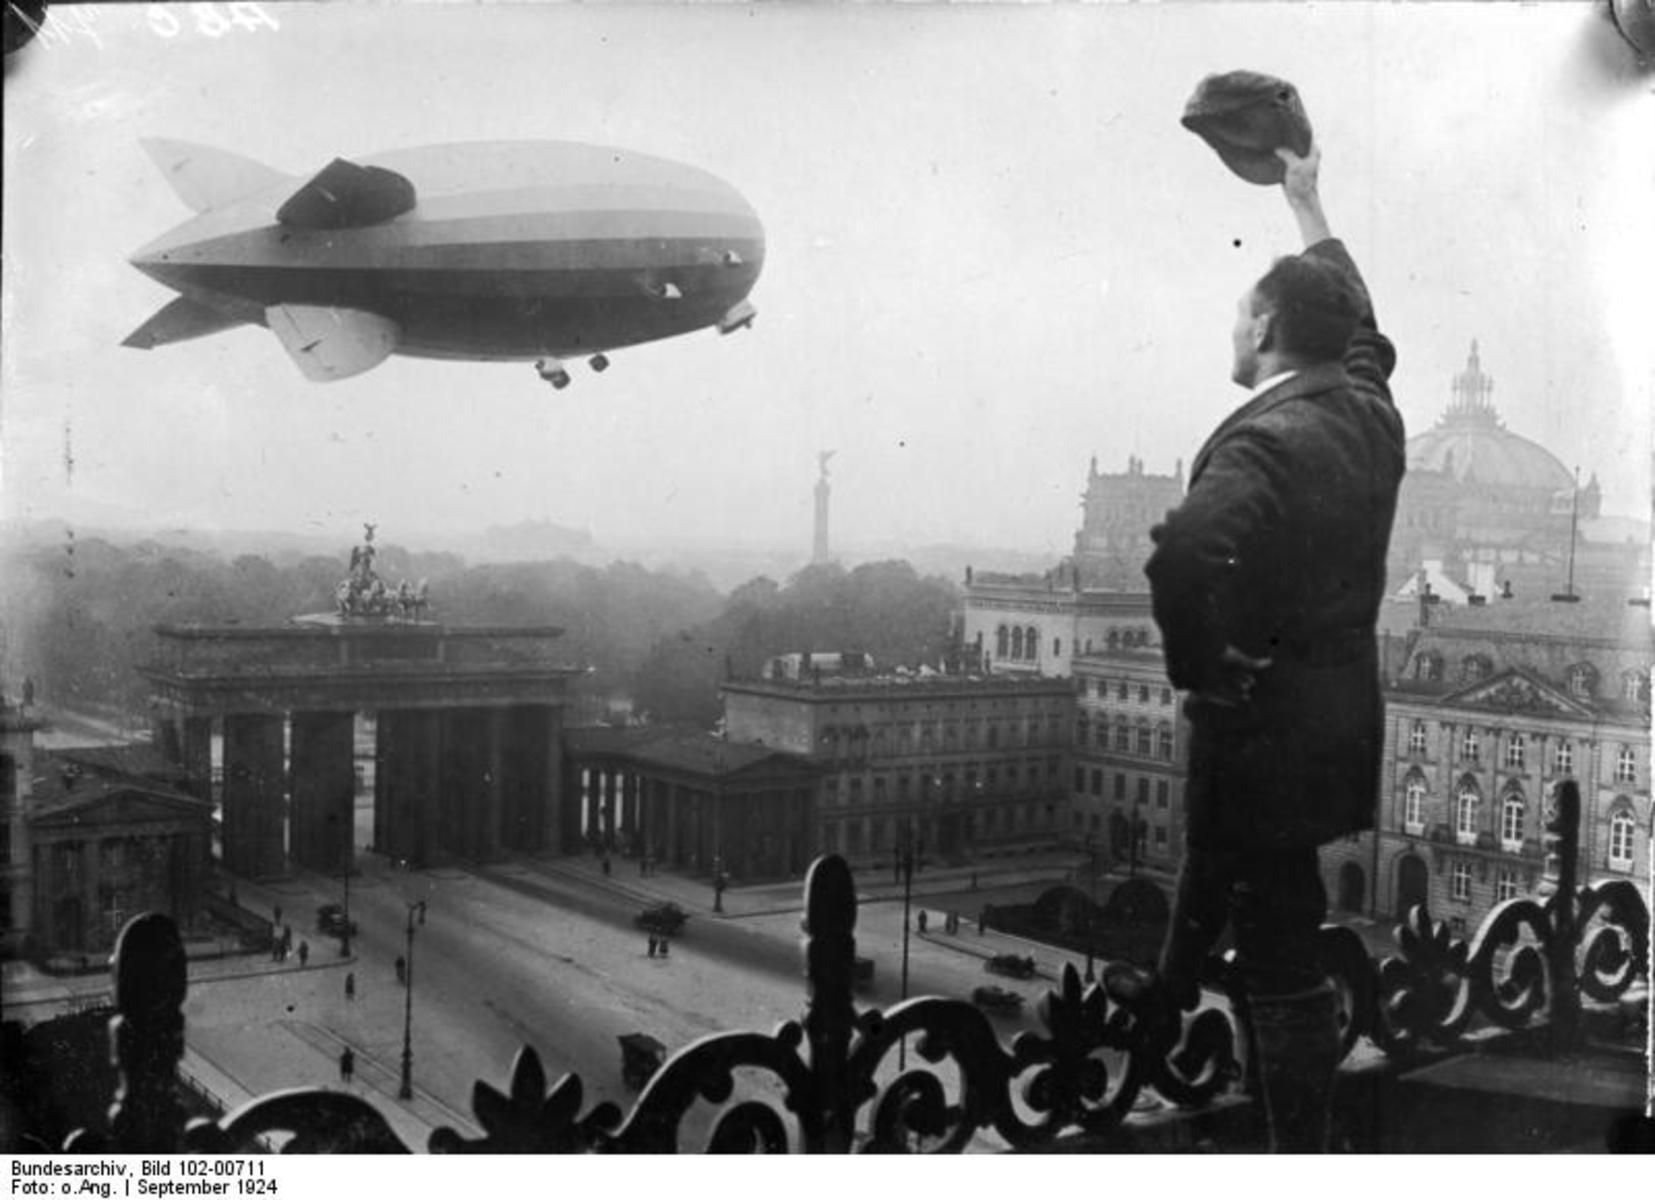 Zeppelin Berlin